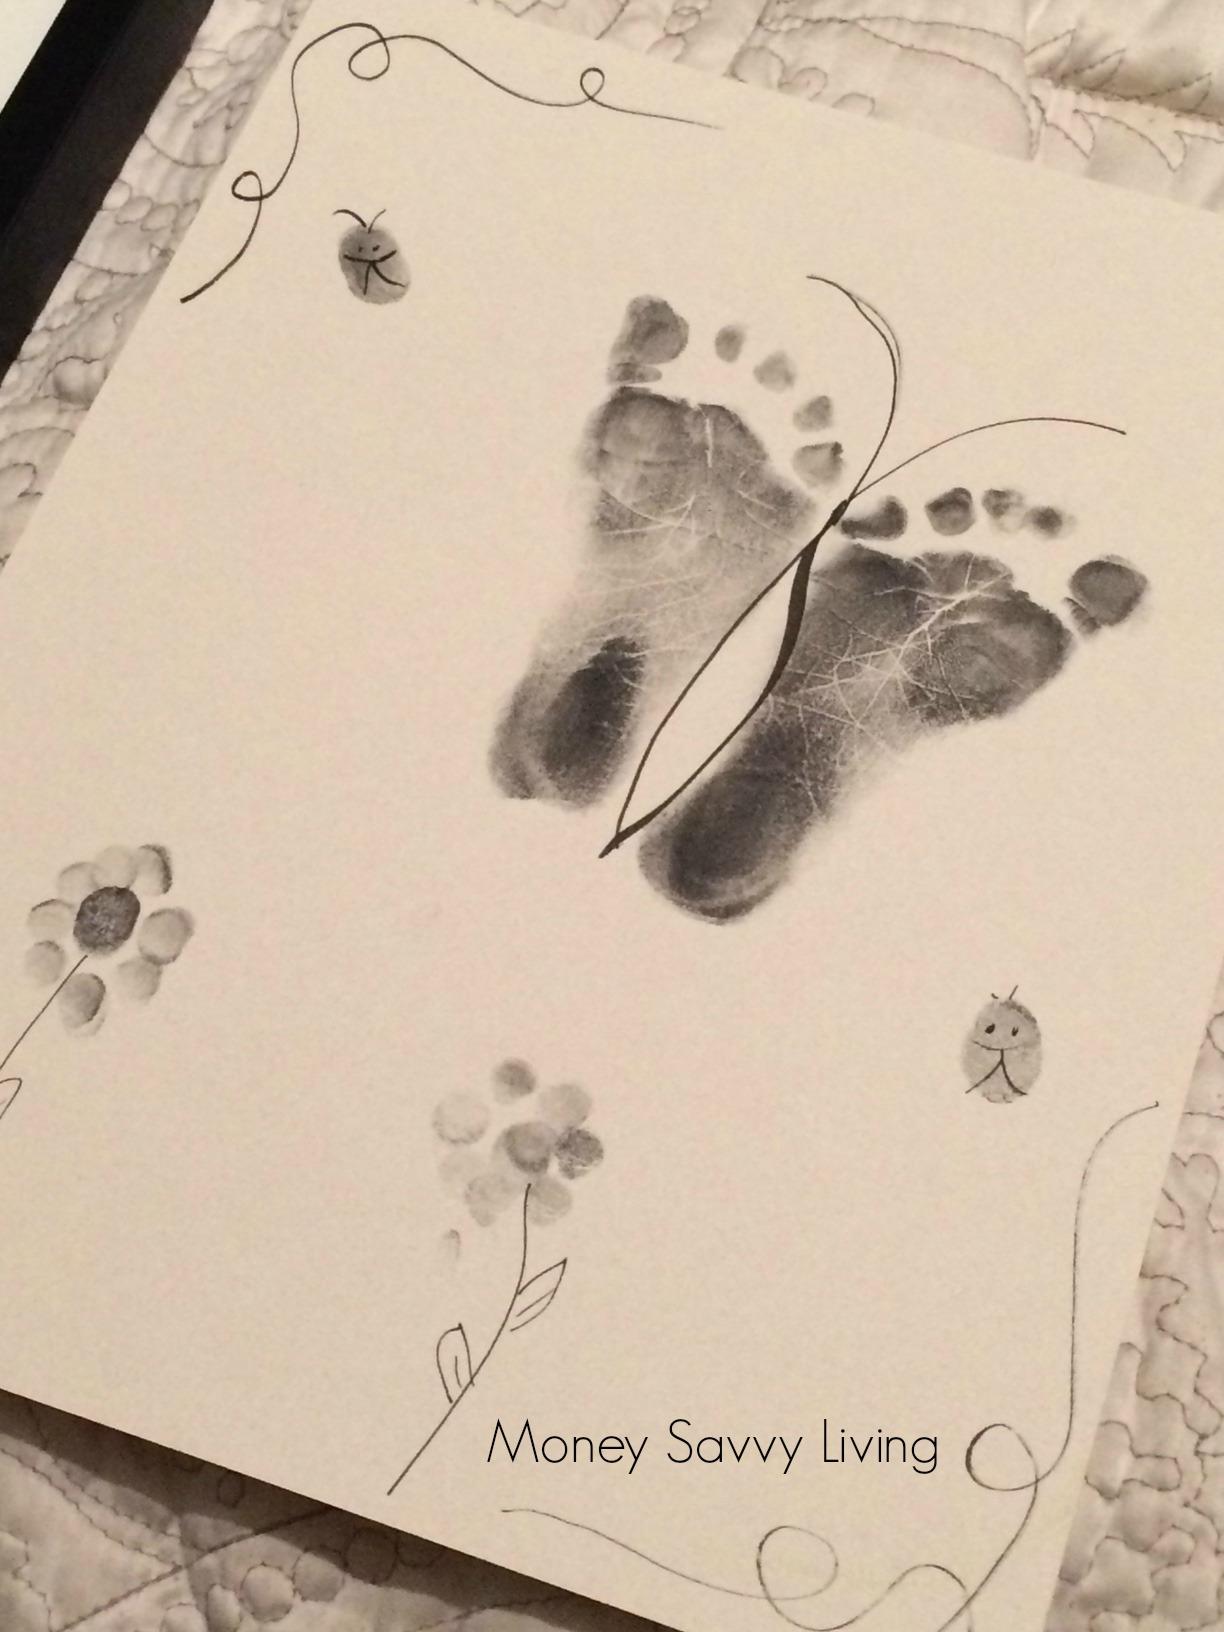 Footprint Keepsake | Money Savvy Living